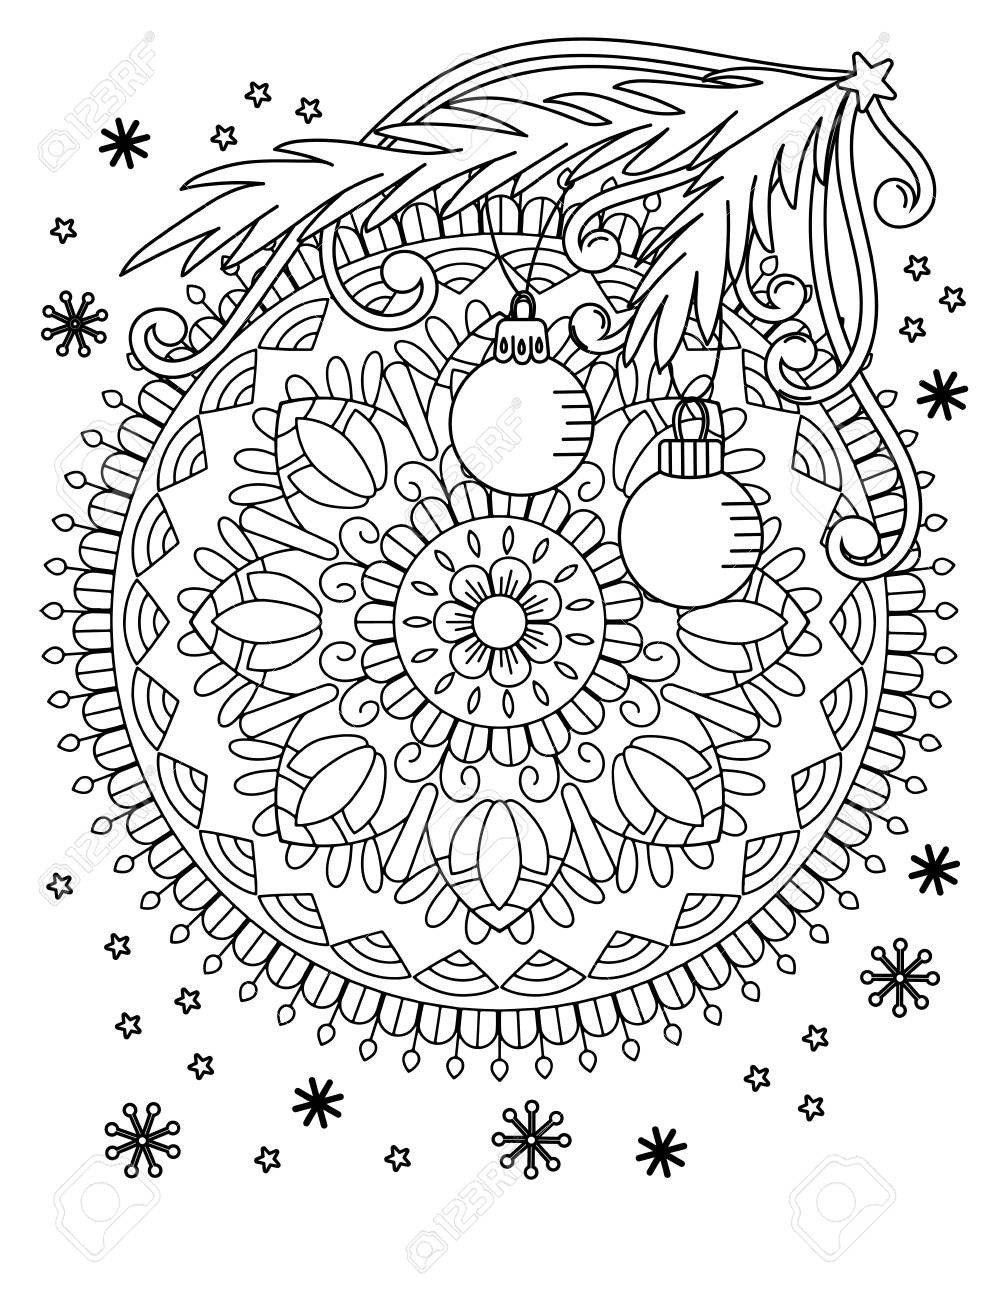 Large Mandala Coloring Pages Mandala Coloringk For Adults Image Inspirations Christmas Mandala Coloring Books Coloring Pages Printable Coloring Pages